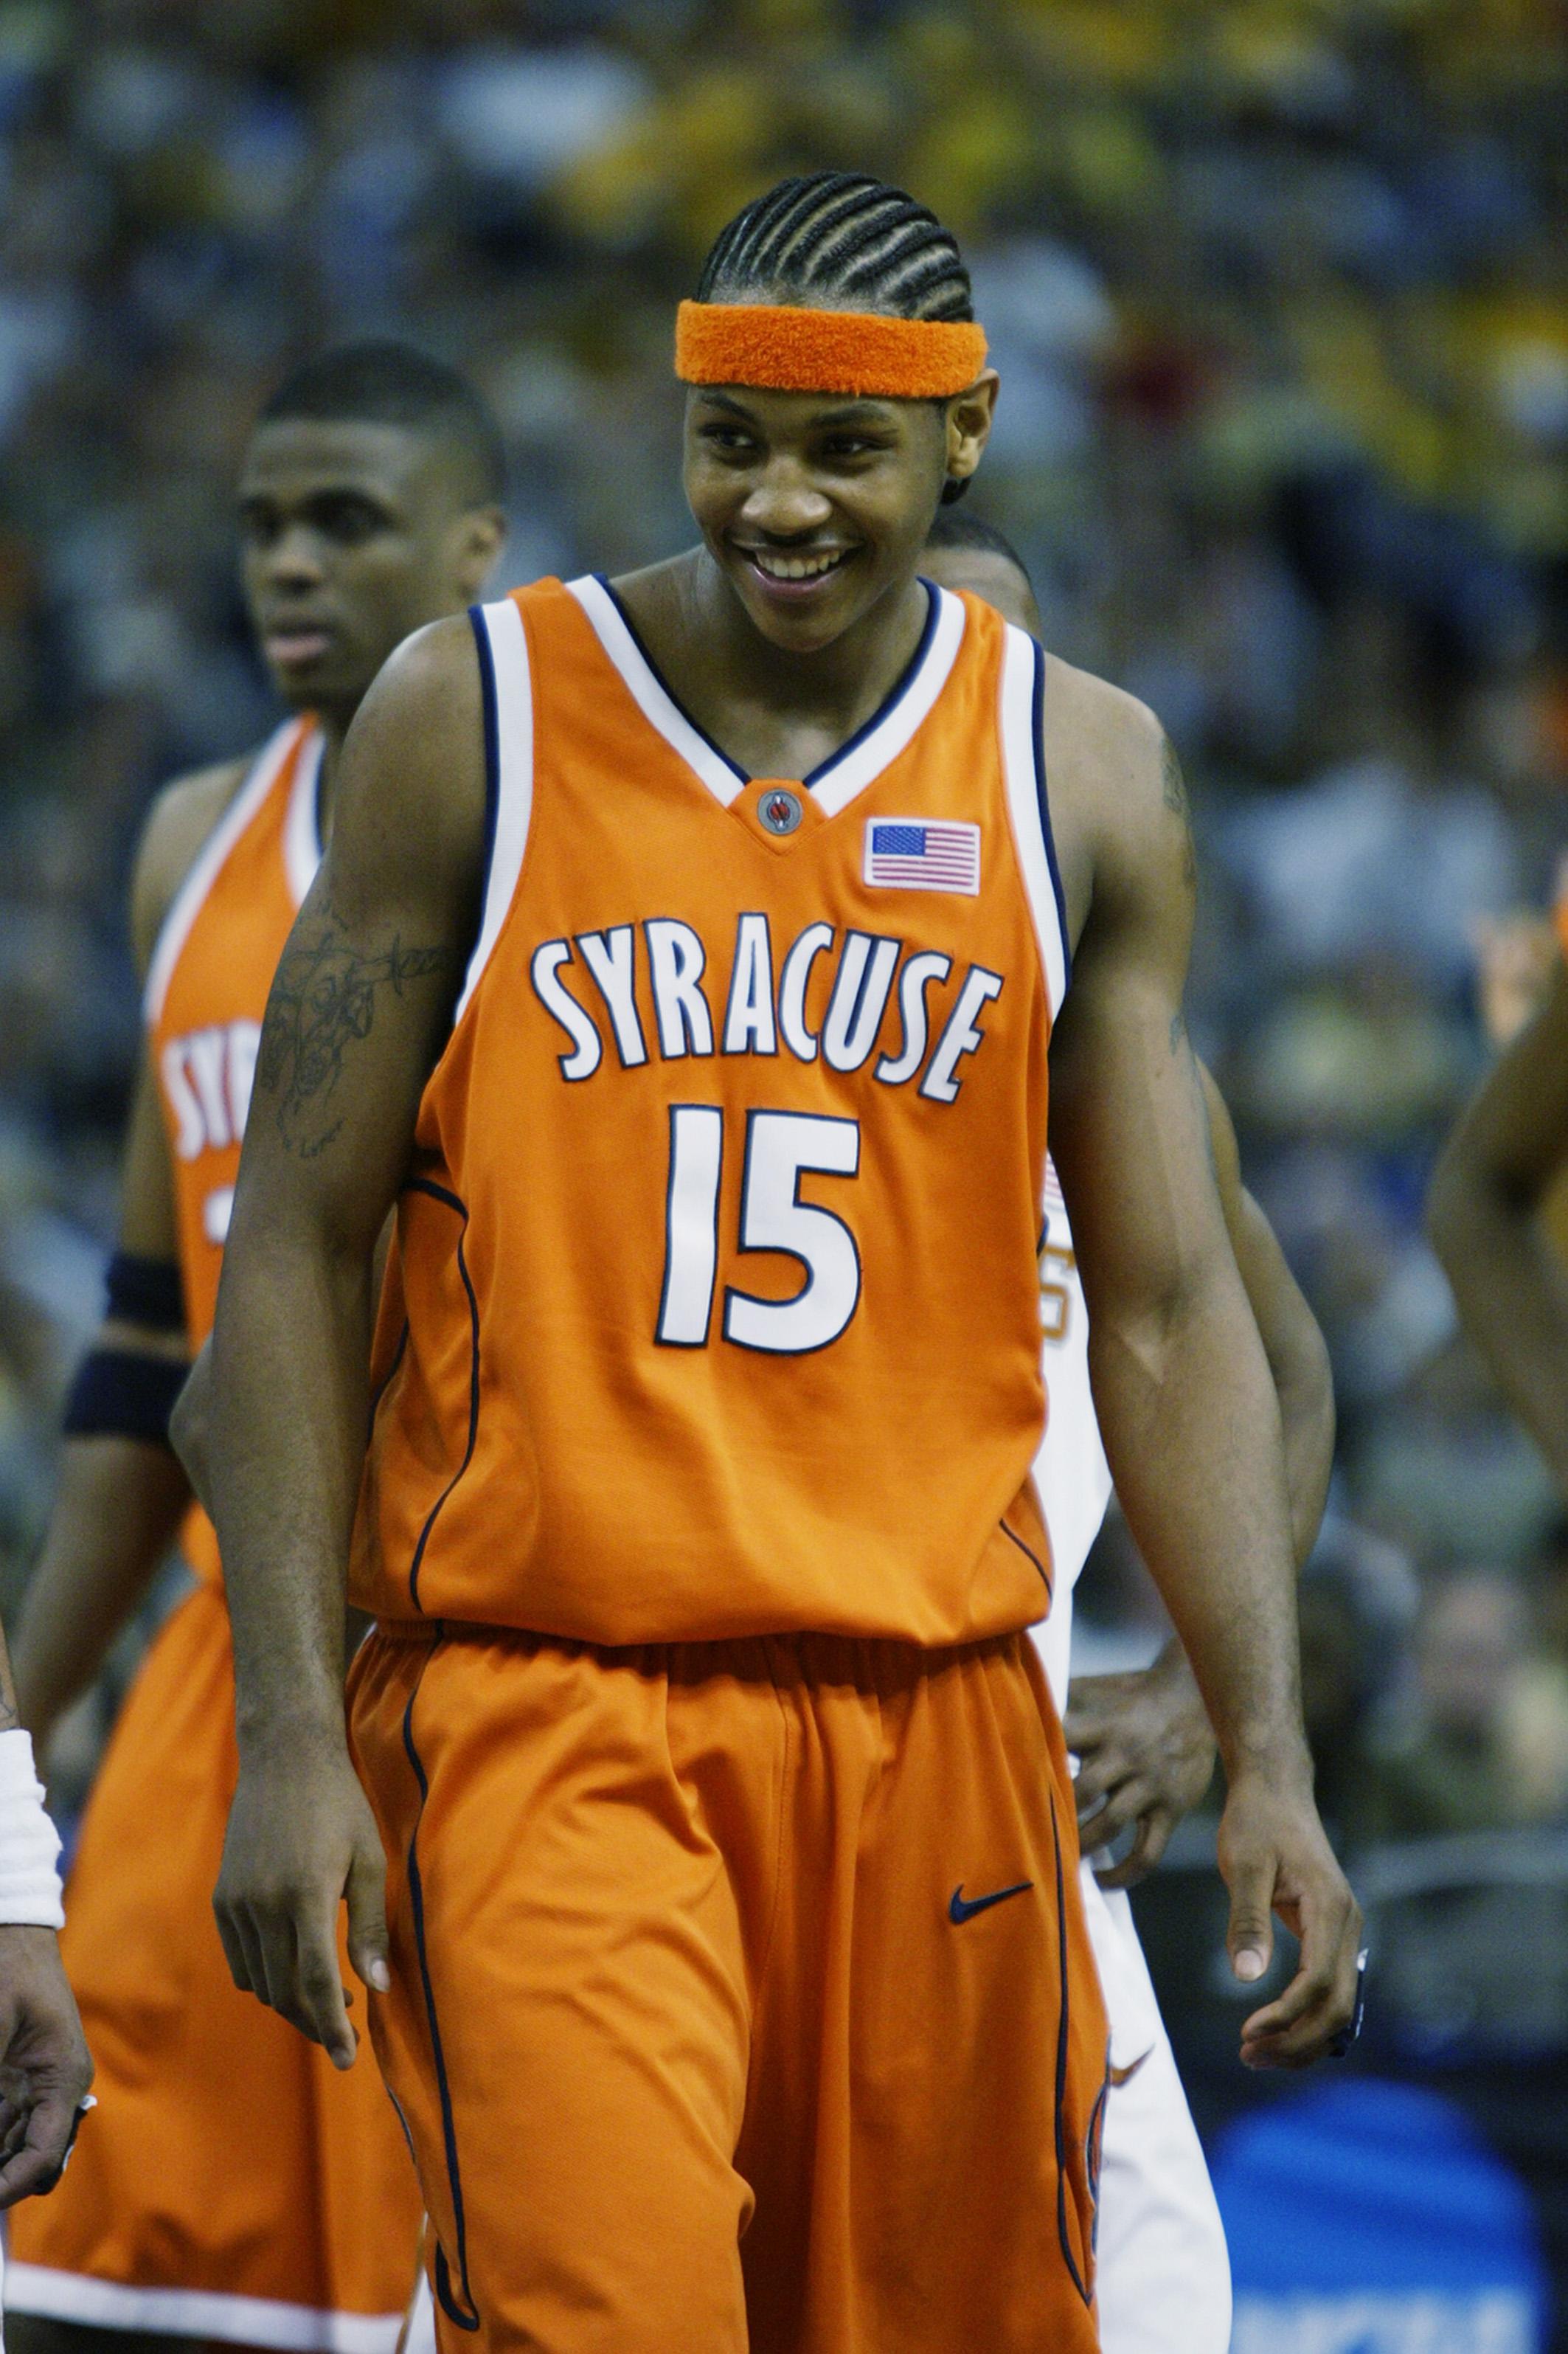 0ab333dd671 NEW ORLEANS - APRIL 5: Carmelo Anthony #15 of the Syracuse University  Orangeman smiles